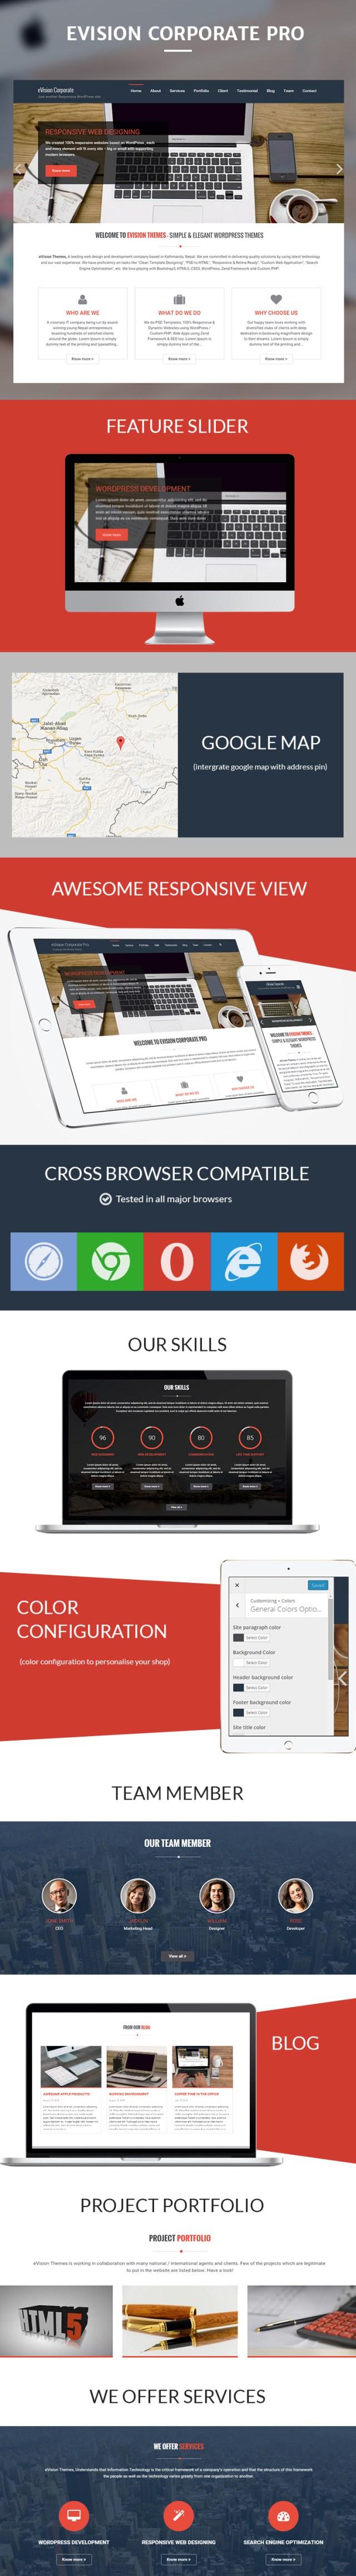 eVision Corporate Pro Details